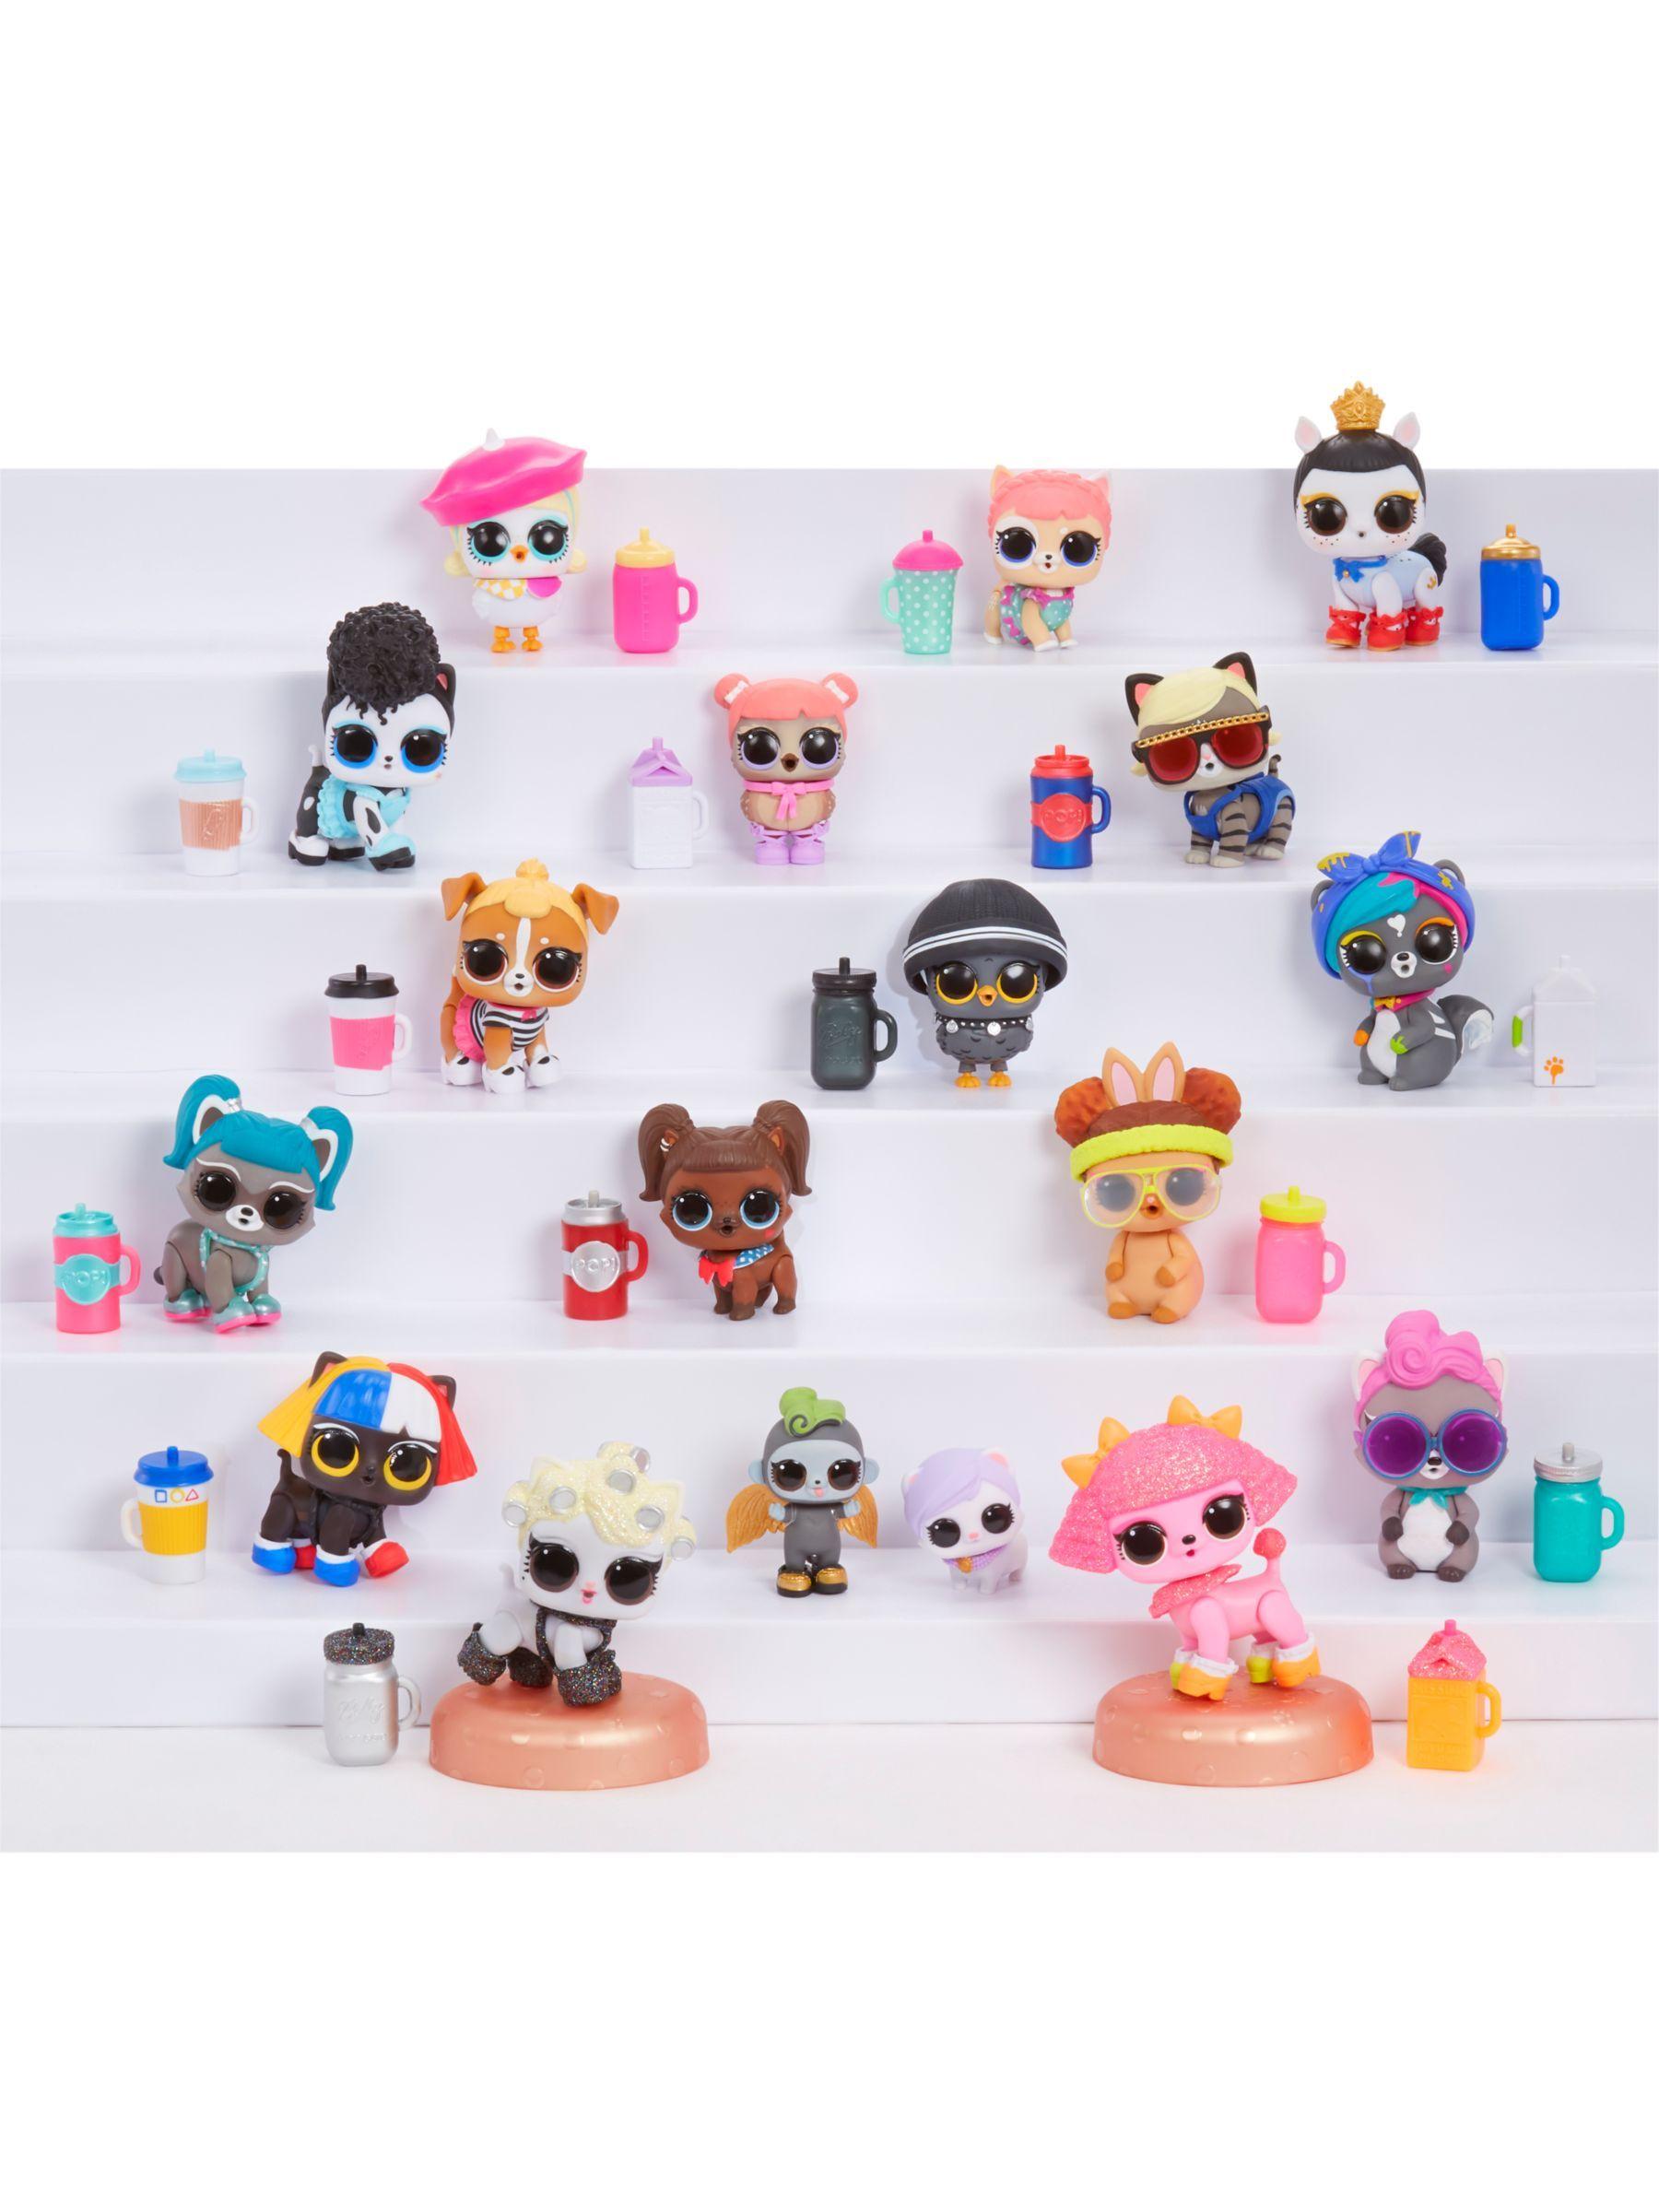 L O L Surprise Fuzzy Pets Assorted Lol Dolls Lol Cute Animals Puppies